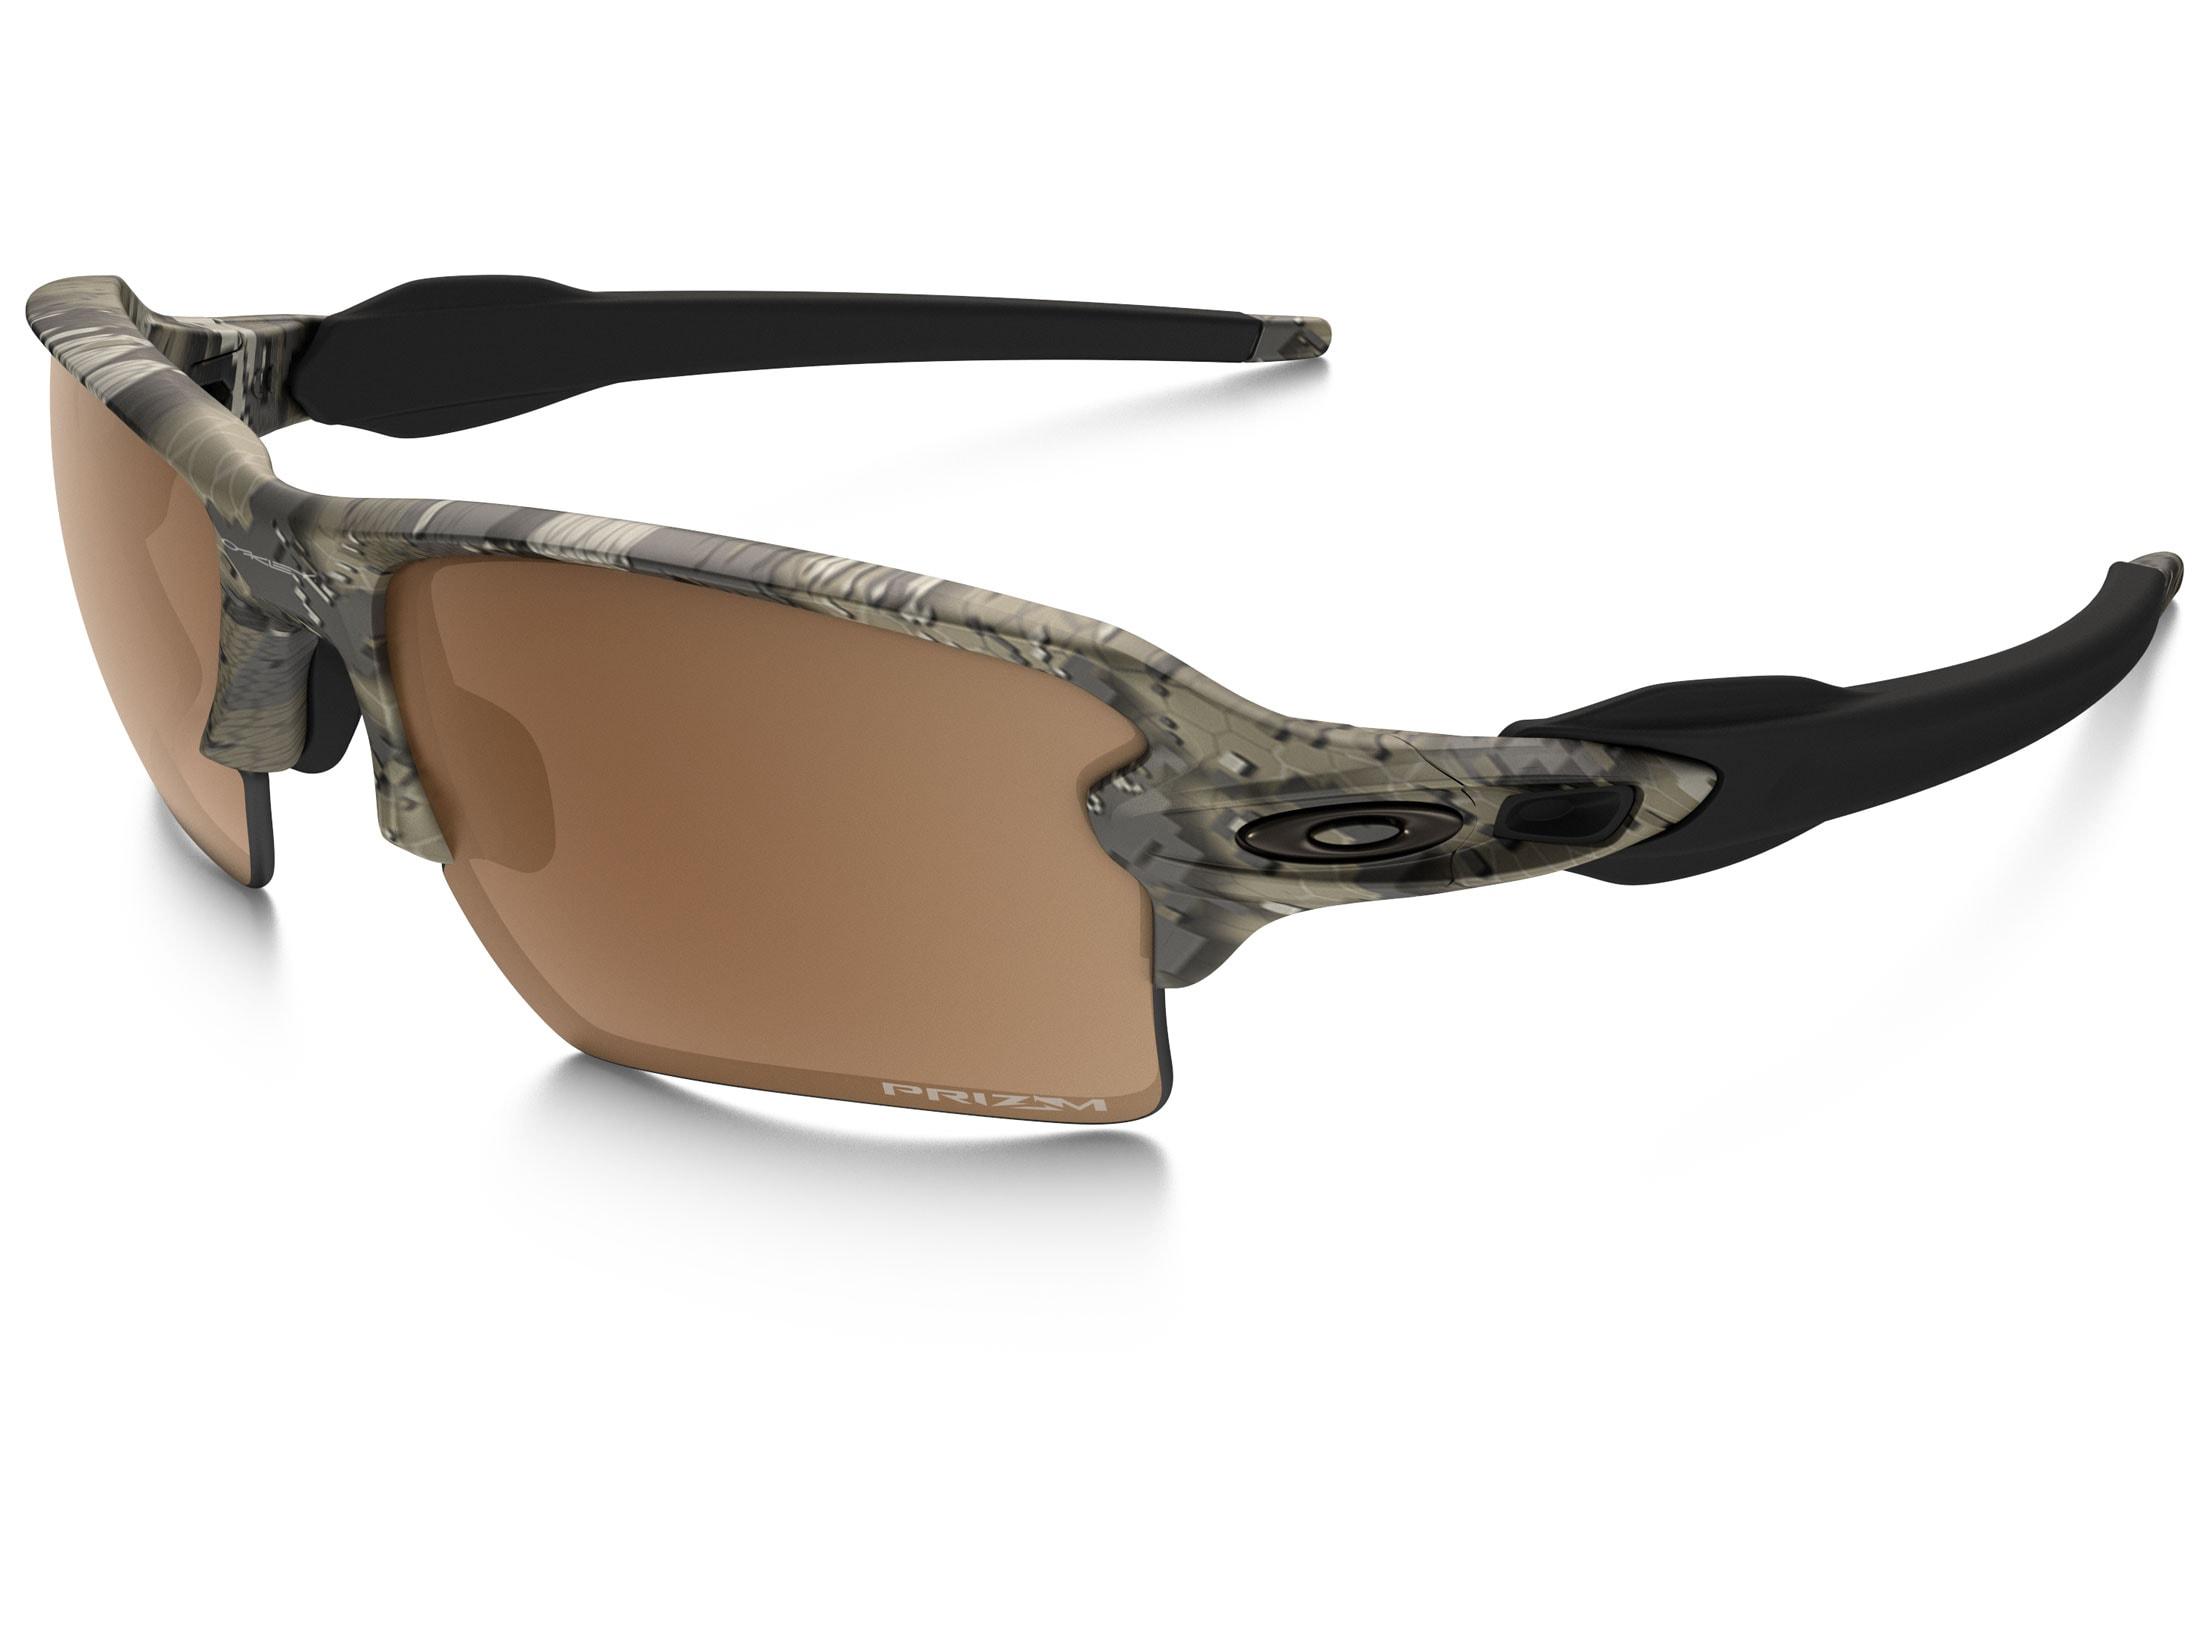 Open Shotgun Design Glasses Spectacle Case  Shooting Gift FREE ENGRAVING